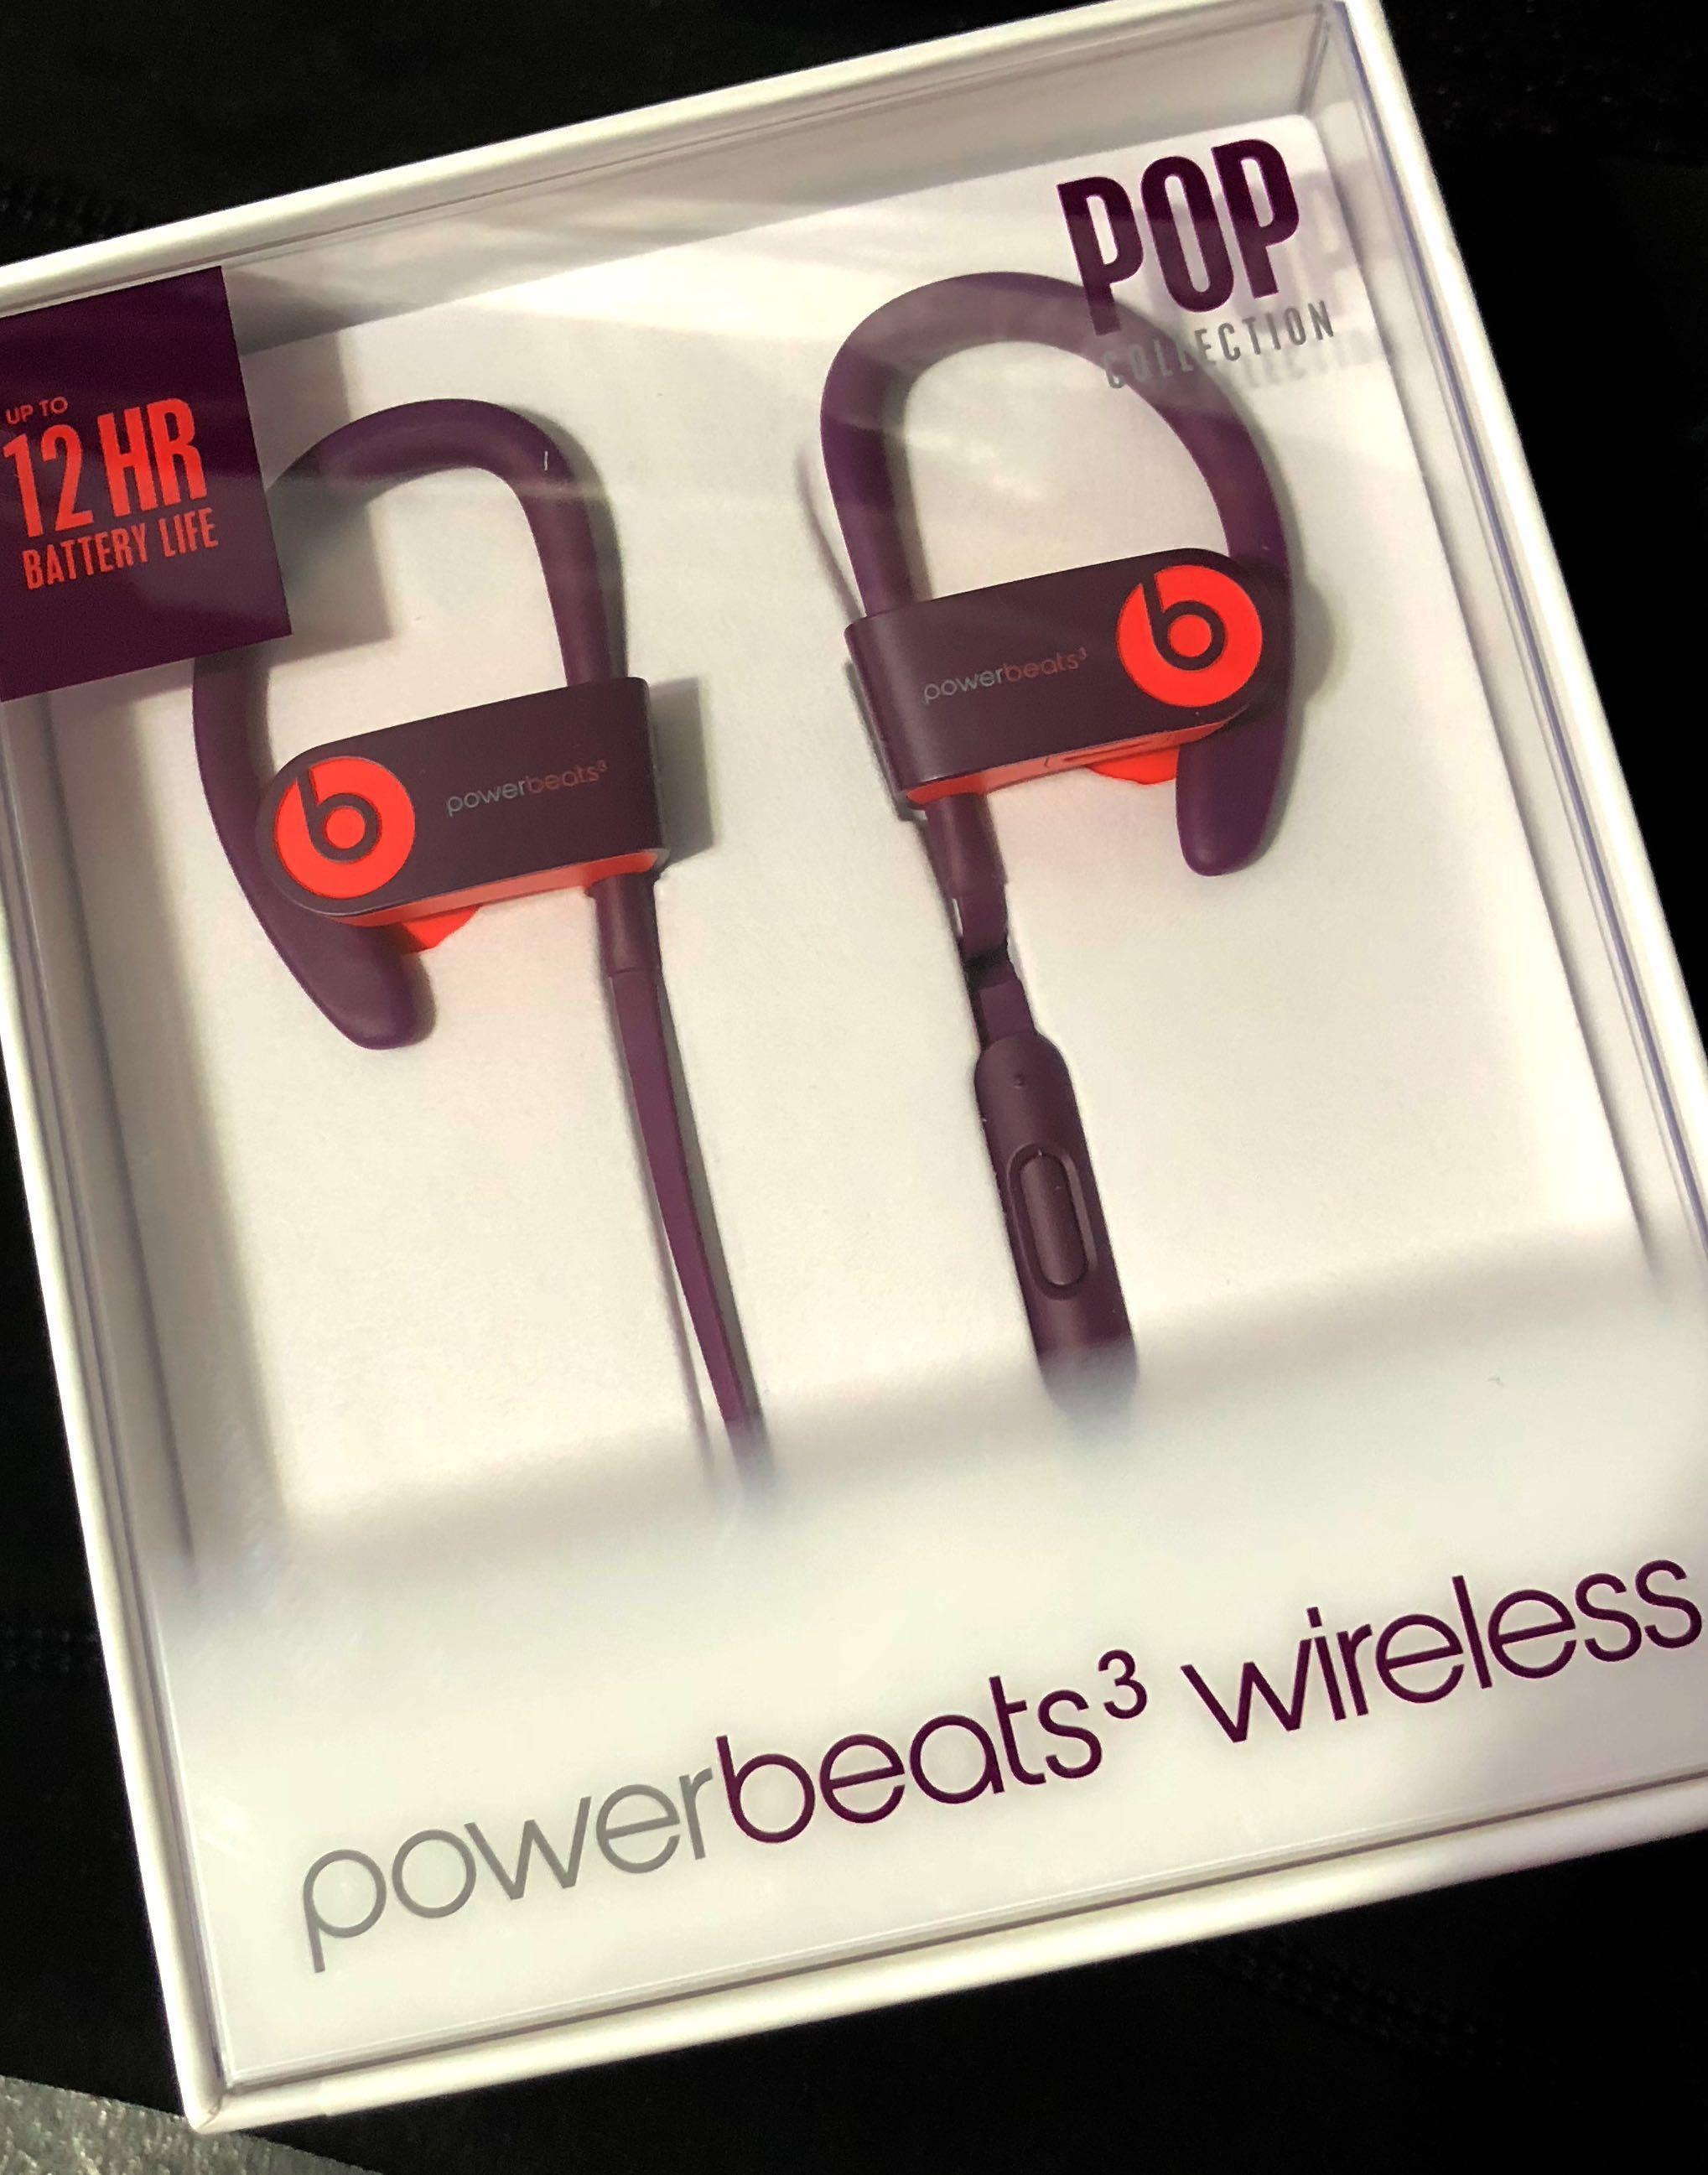 a9fcabeaa24 Powerbeats 3 Wireless Earphone, Electronics, Audio on Carousell